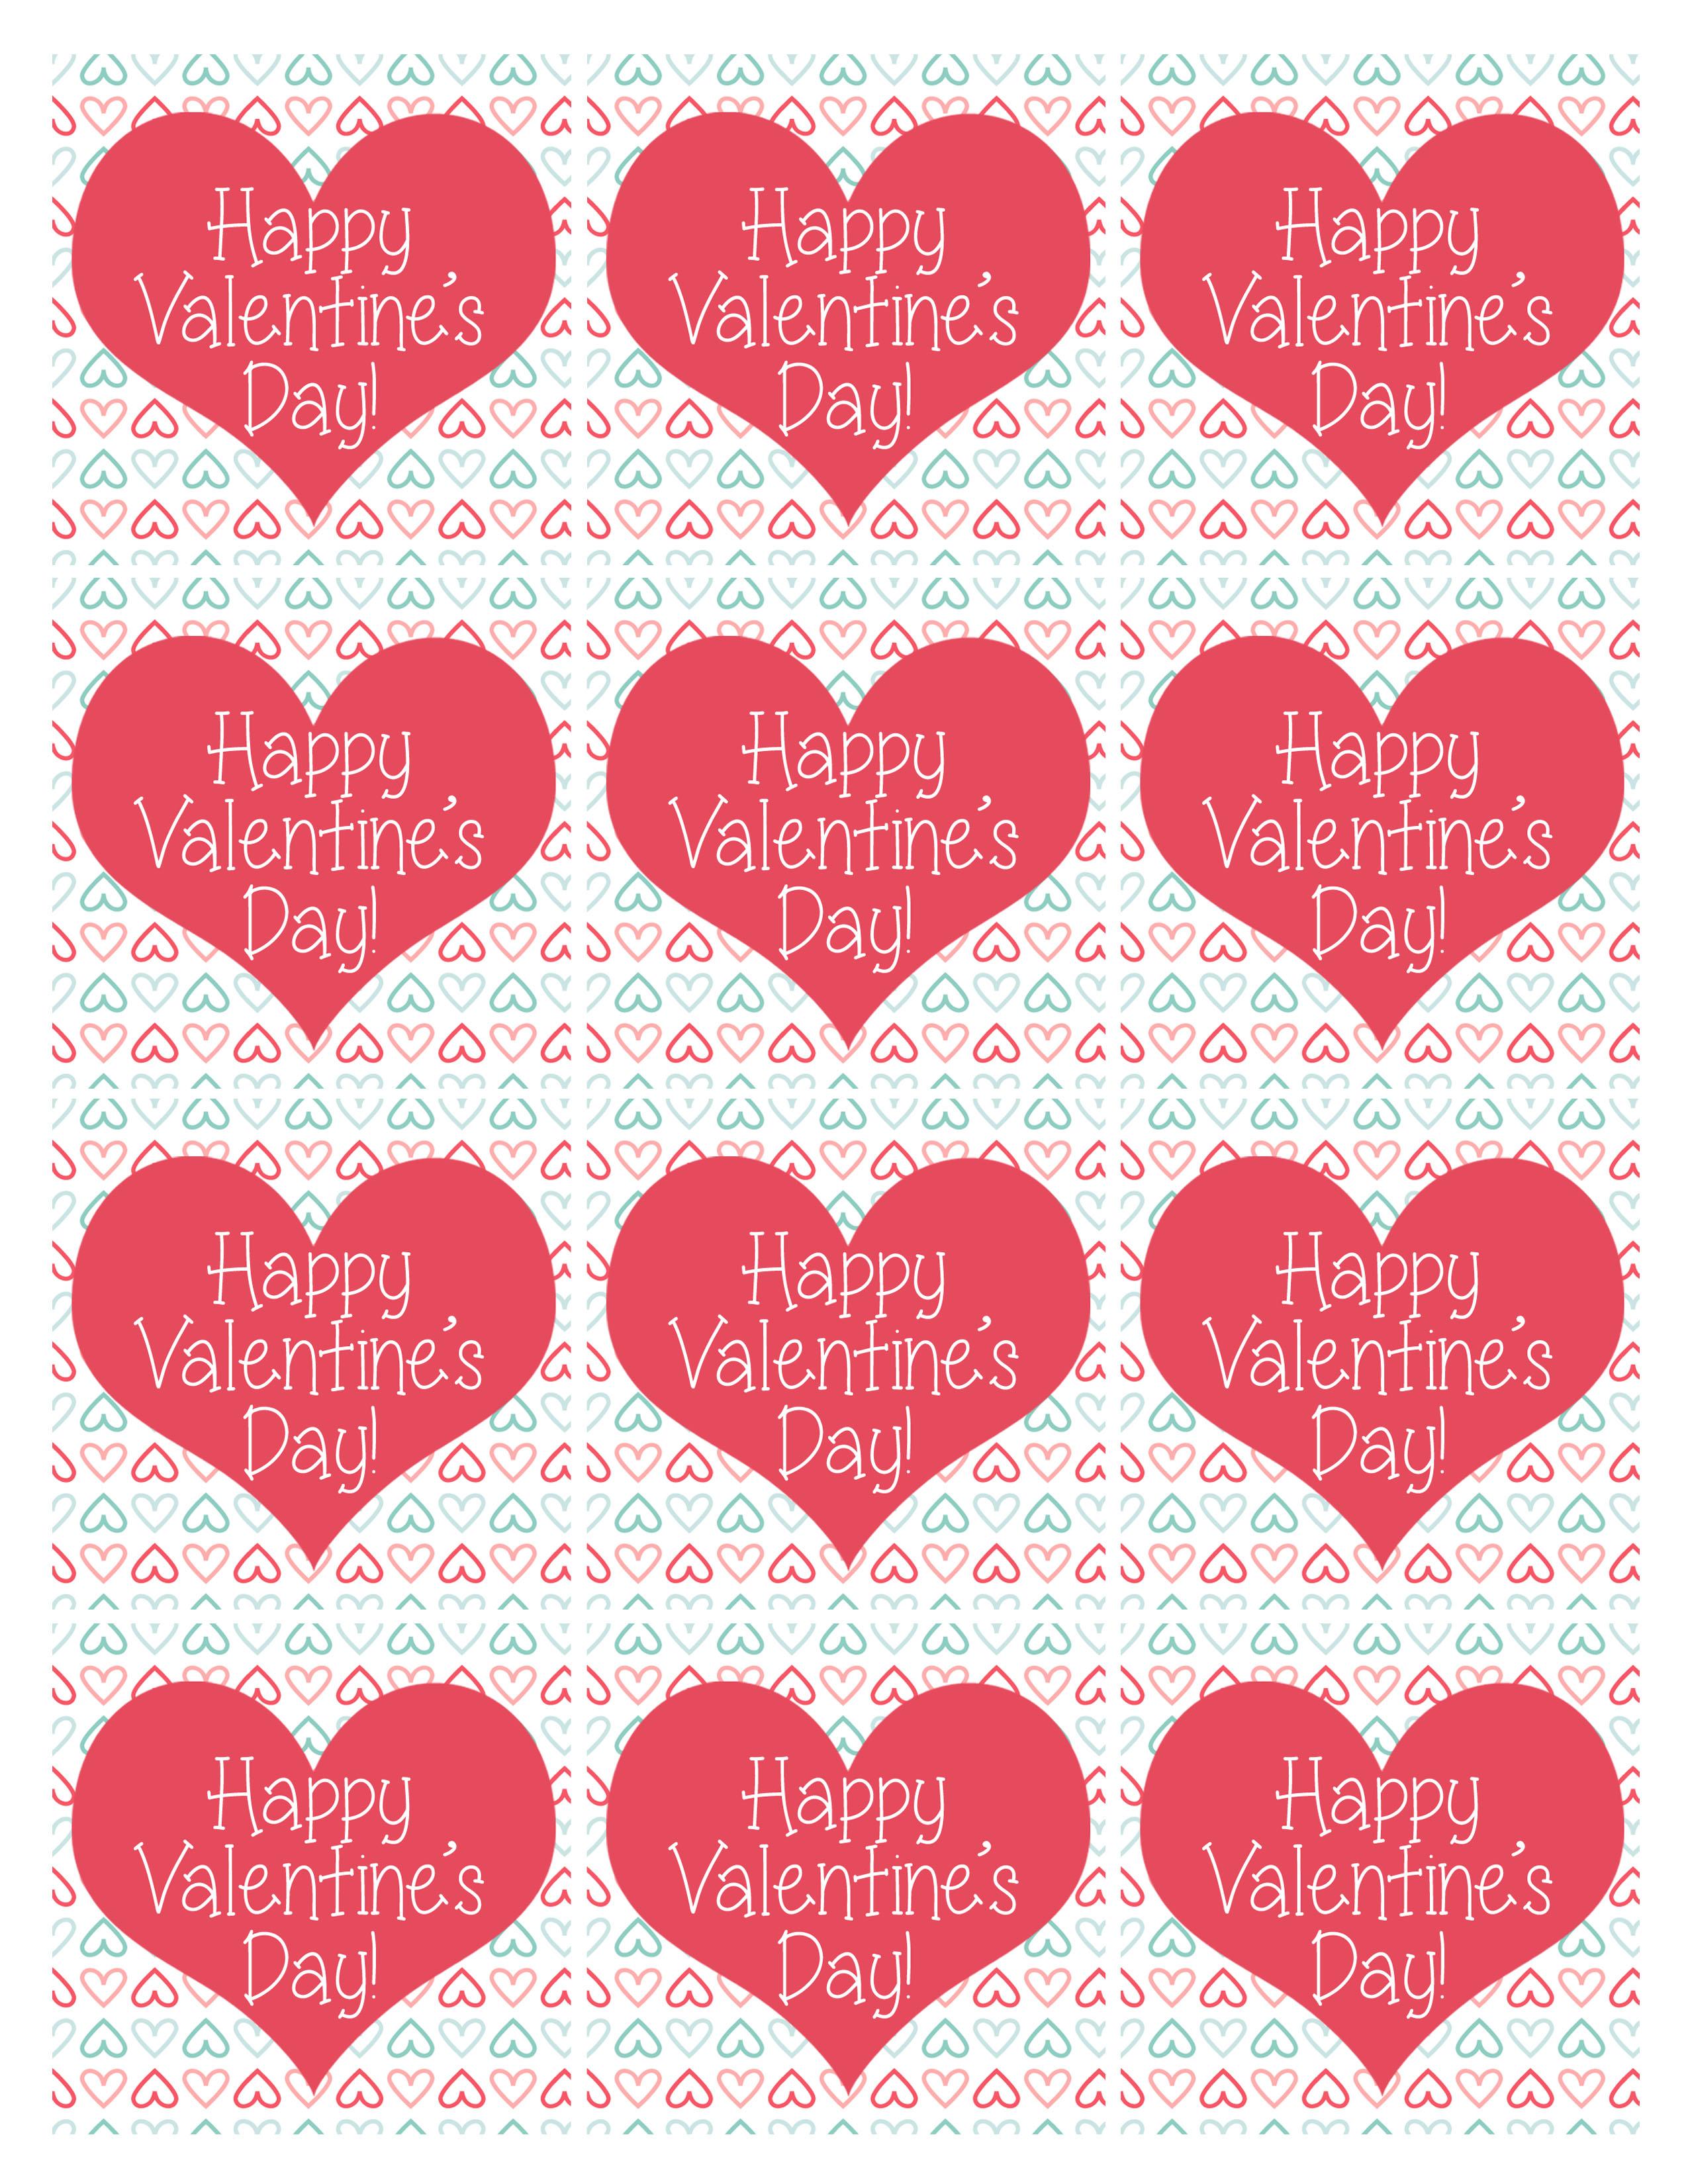 6 Best Images Of Free Printable Valentine Treat Tags Valentine S Day Tag Free Printable Valentine Treat Bag Tags And Printable Valentine Treat Gift Tags Printablee Com